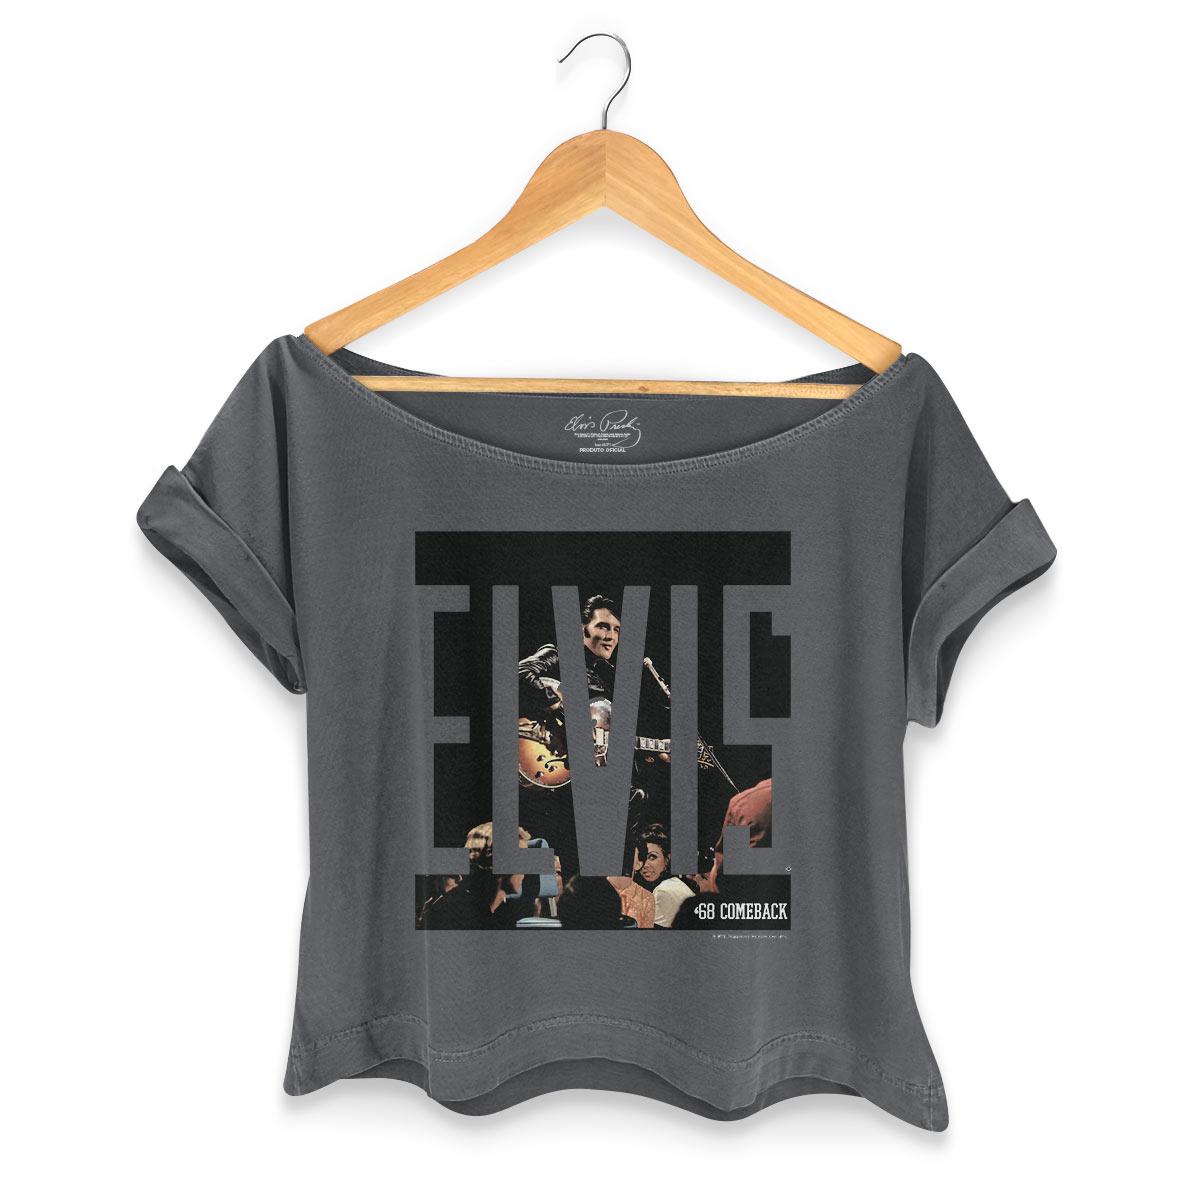 T-shirt Premium Feminina Elvis Presley ´68 Comeback Black